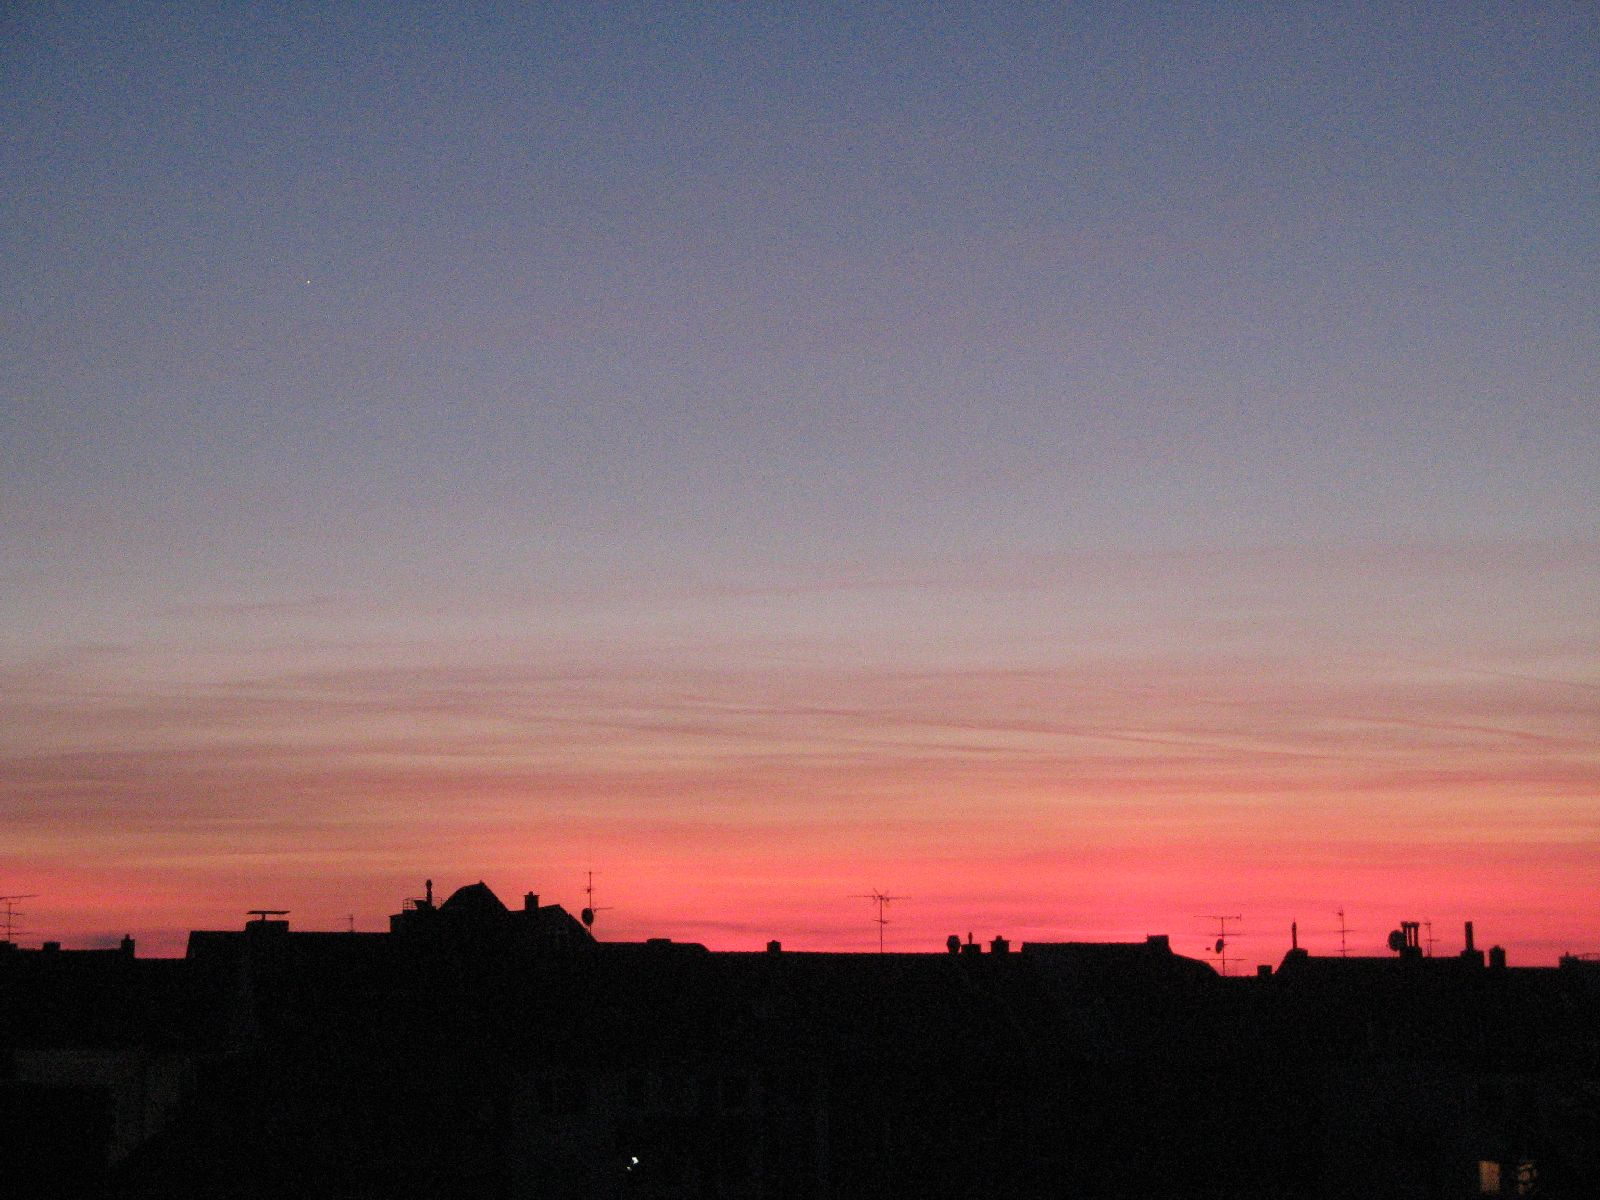 Himmel-Wolken-Foto_Textur_B_3399